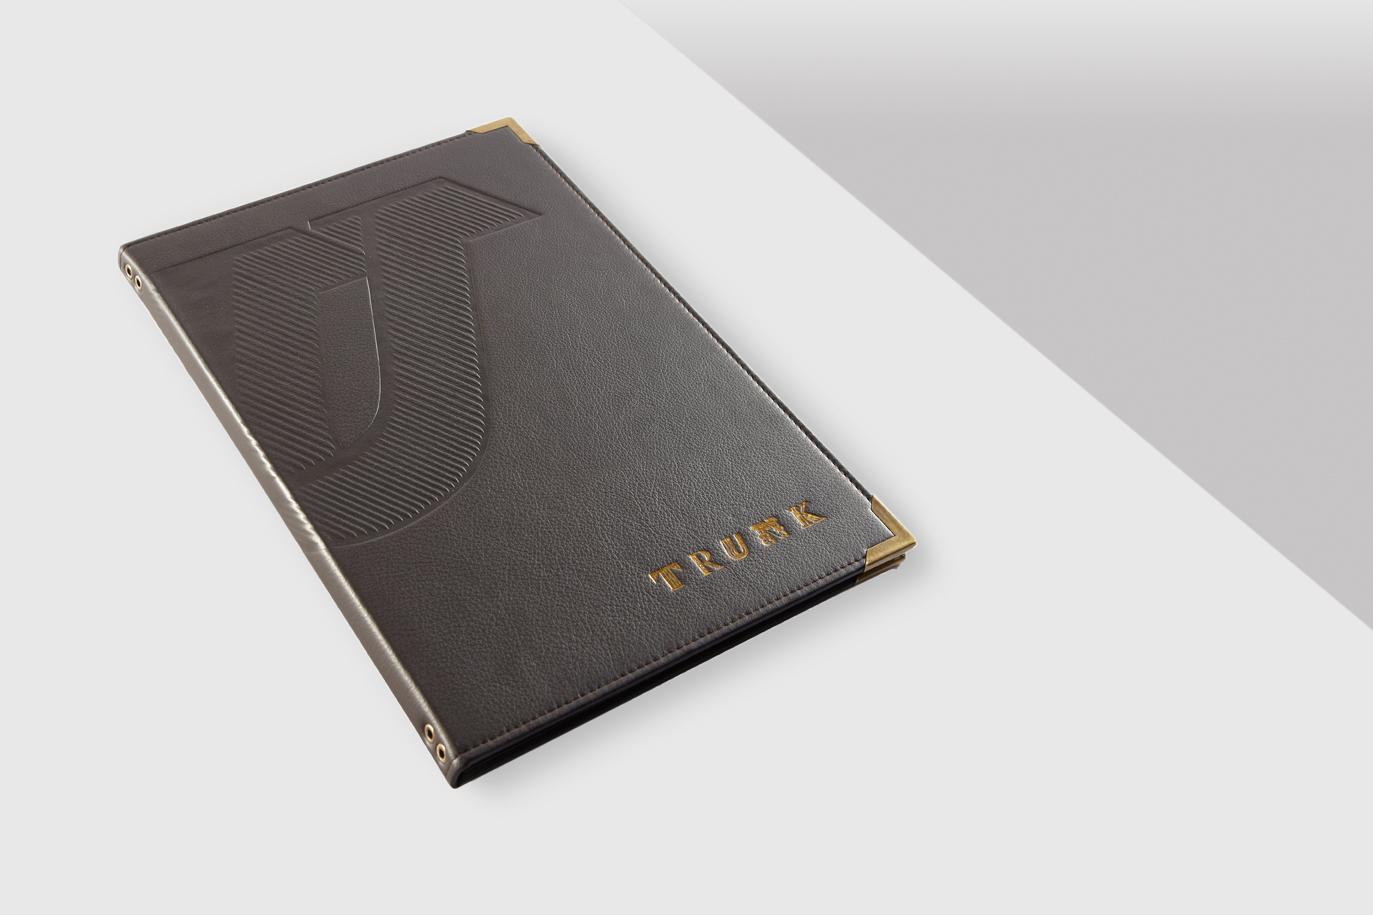 Progress Packaging Trunk Custom Bespoke Leather Luxury Menu Covers Made In The UK